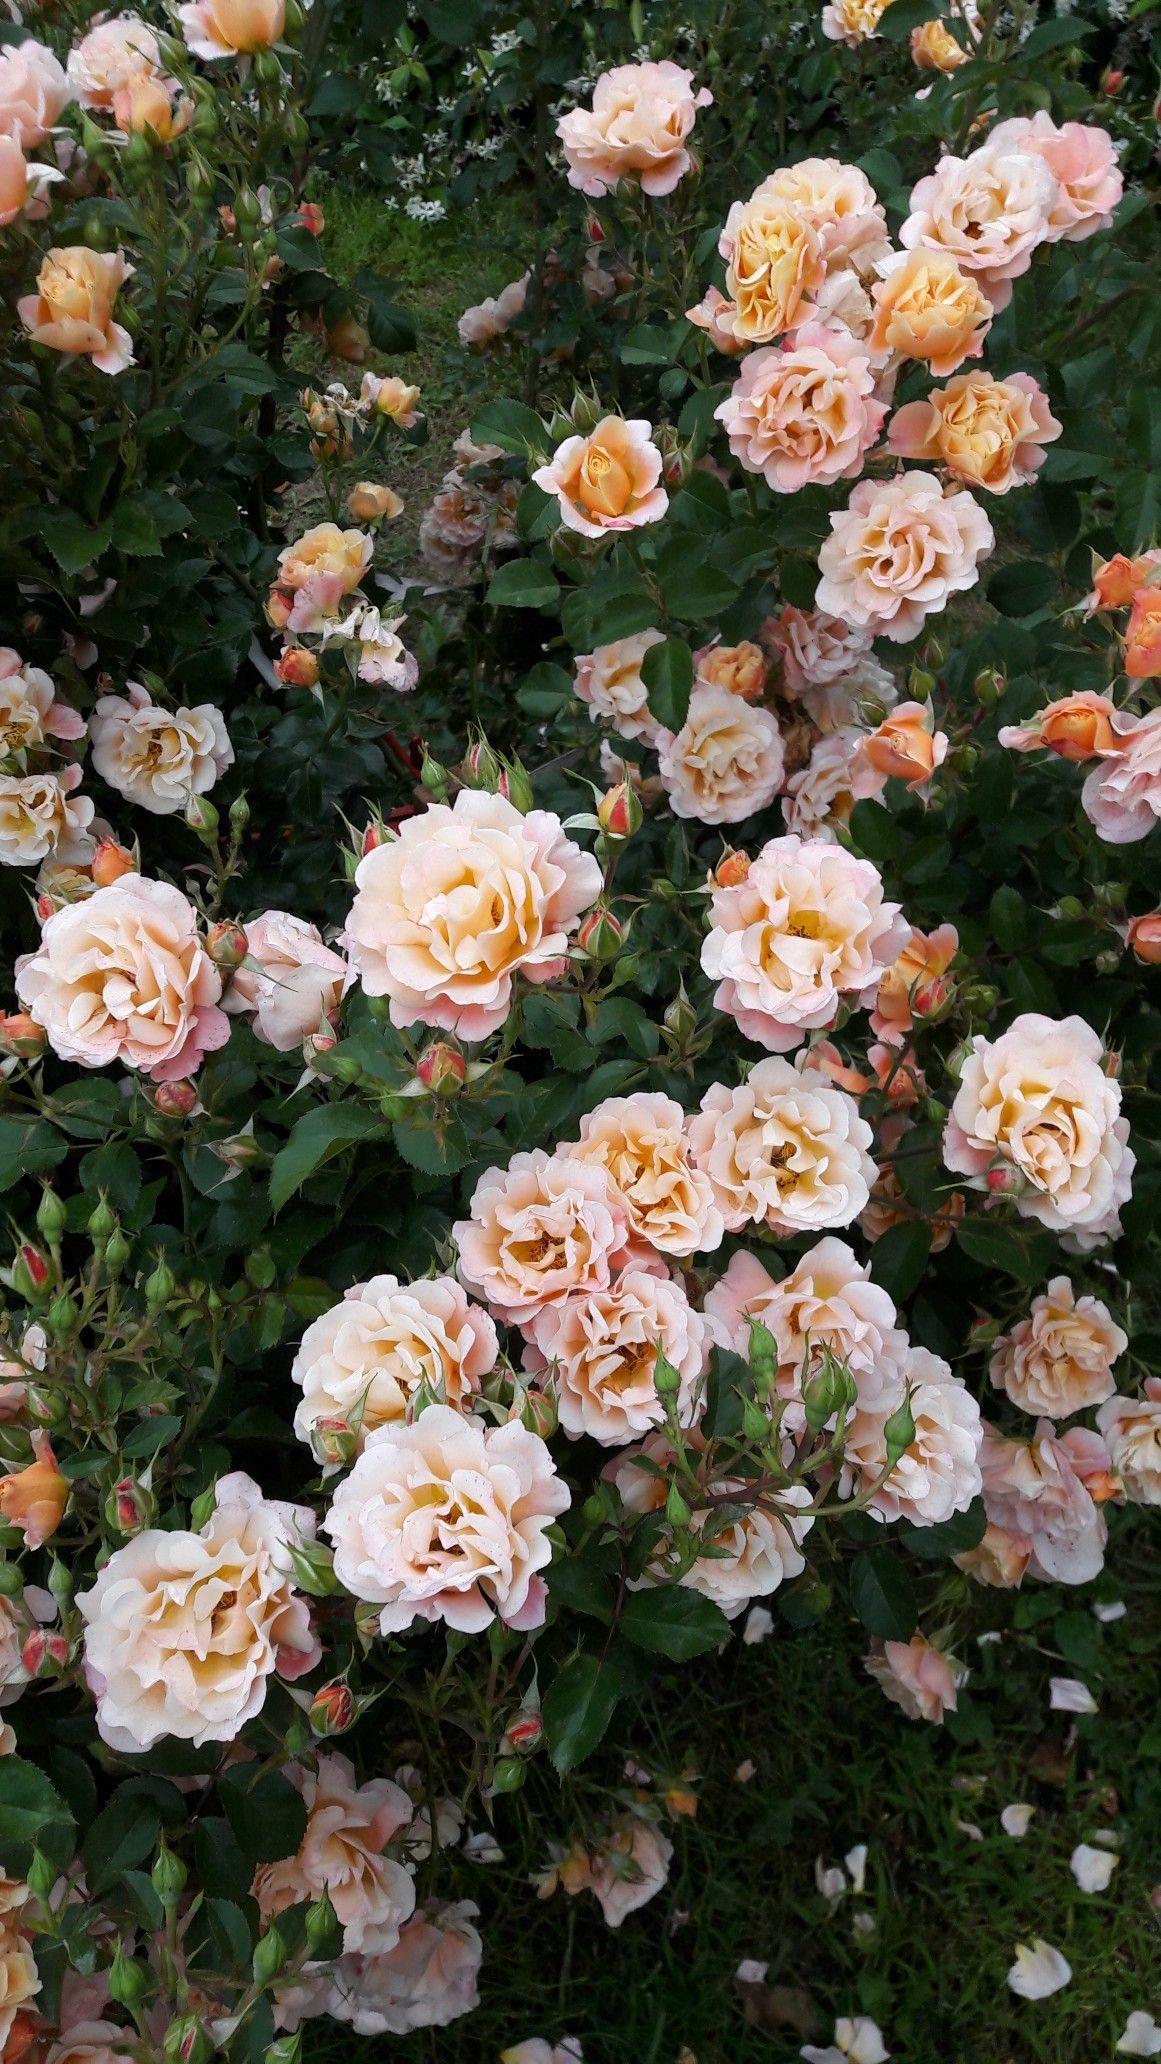 28 Aesthetic Flowers Wallpapers On Wallpapersafari